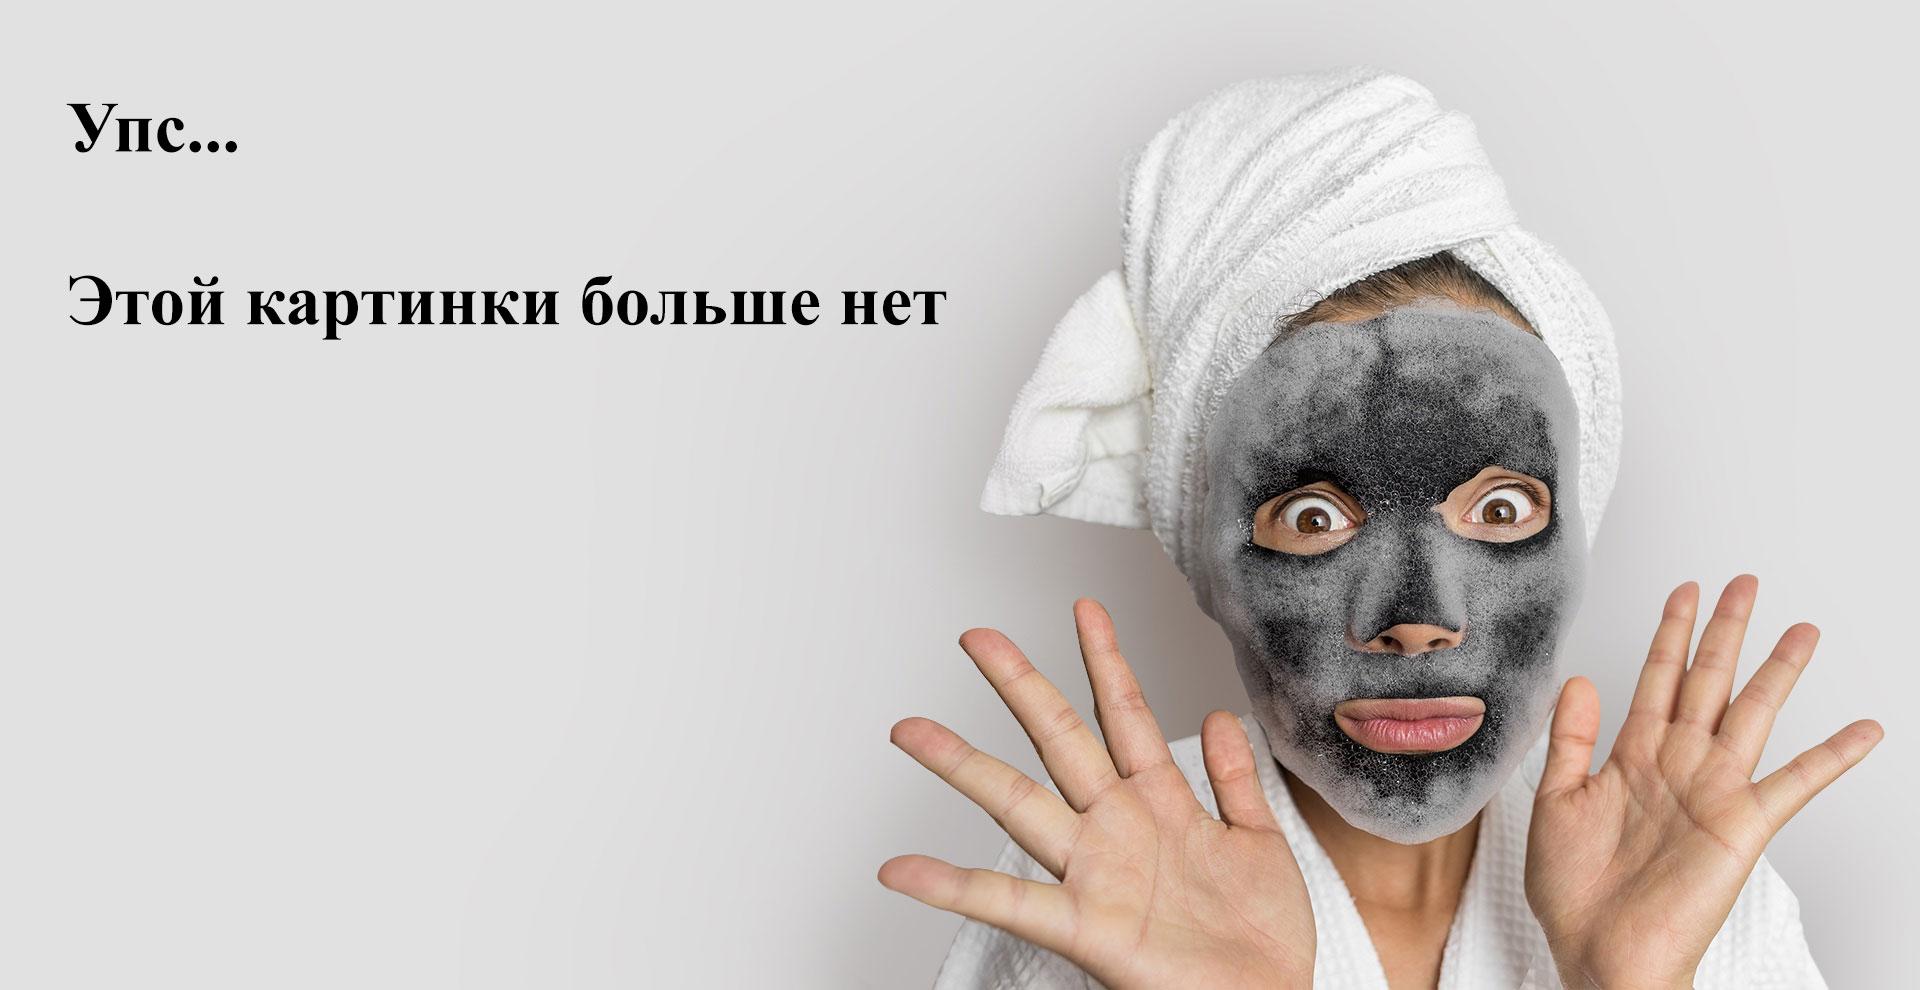 Patrisa Nail, Гель-лак Московская сага №761